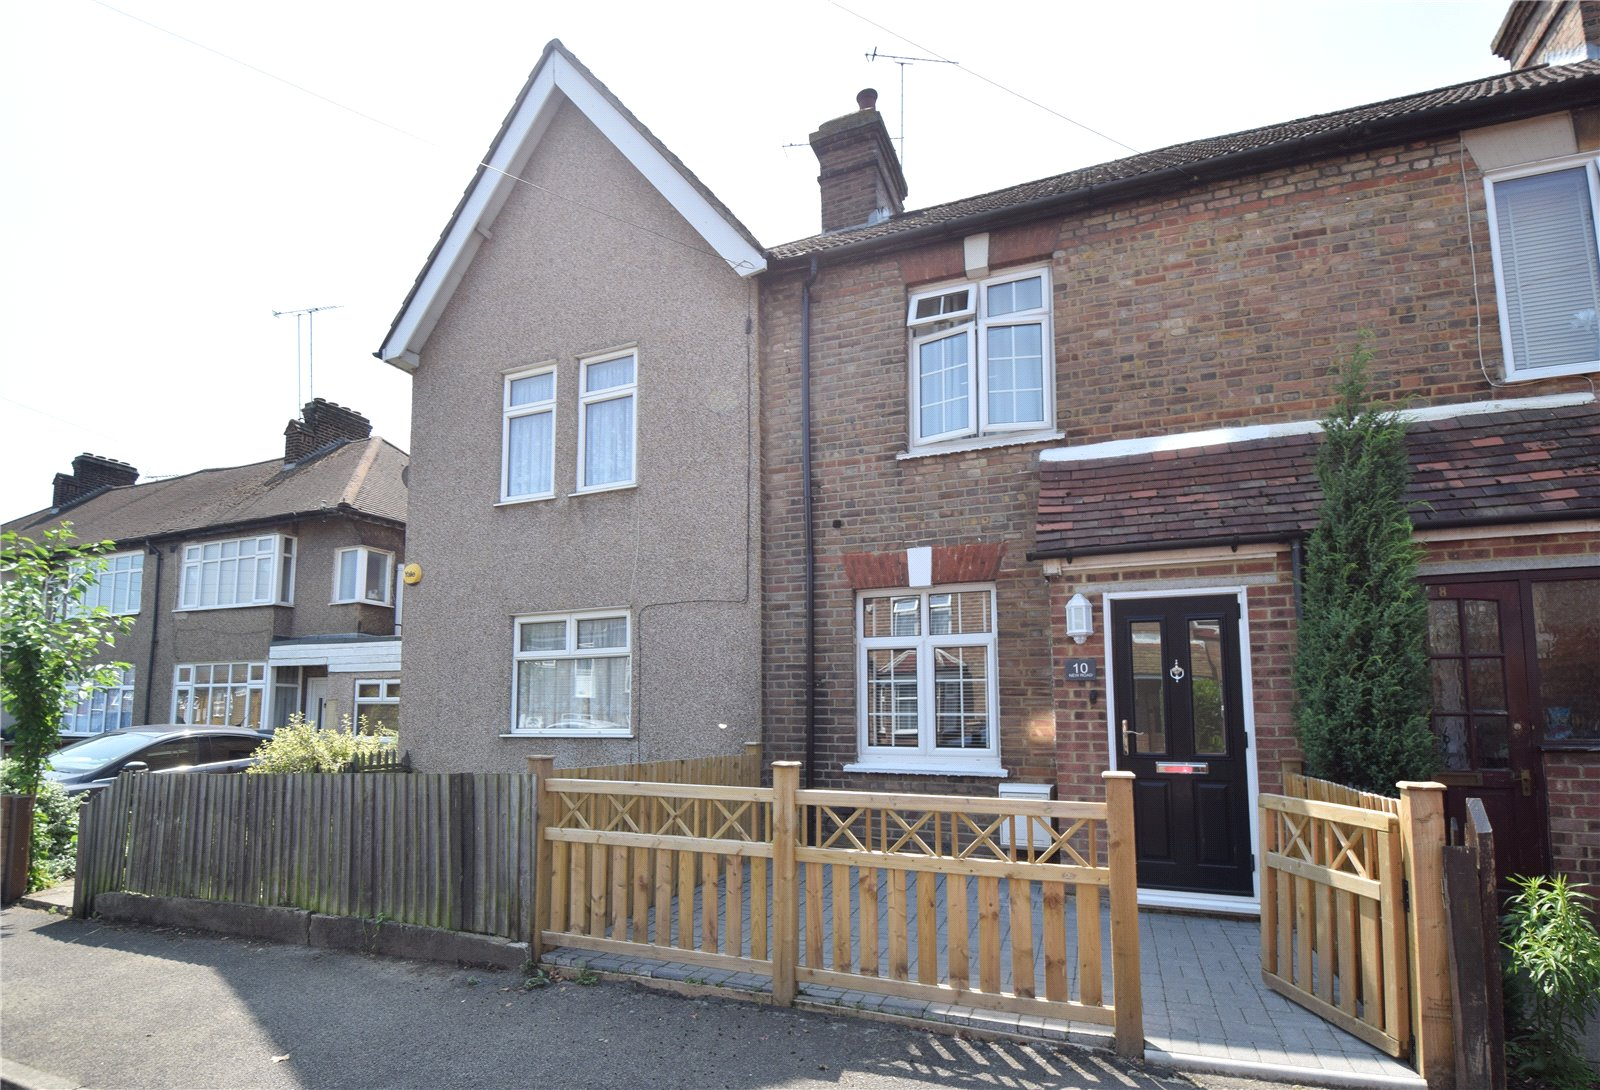 New Road, Swanley, Kent, BR8